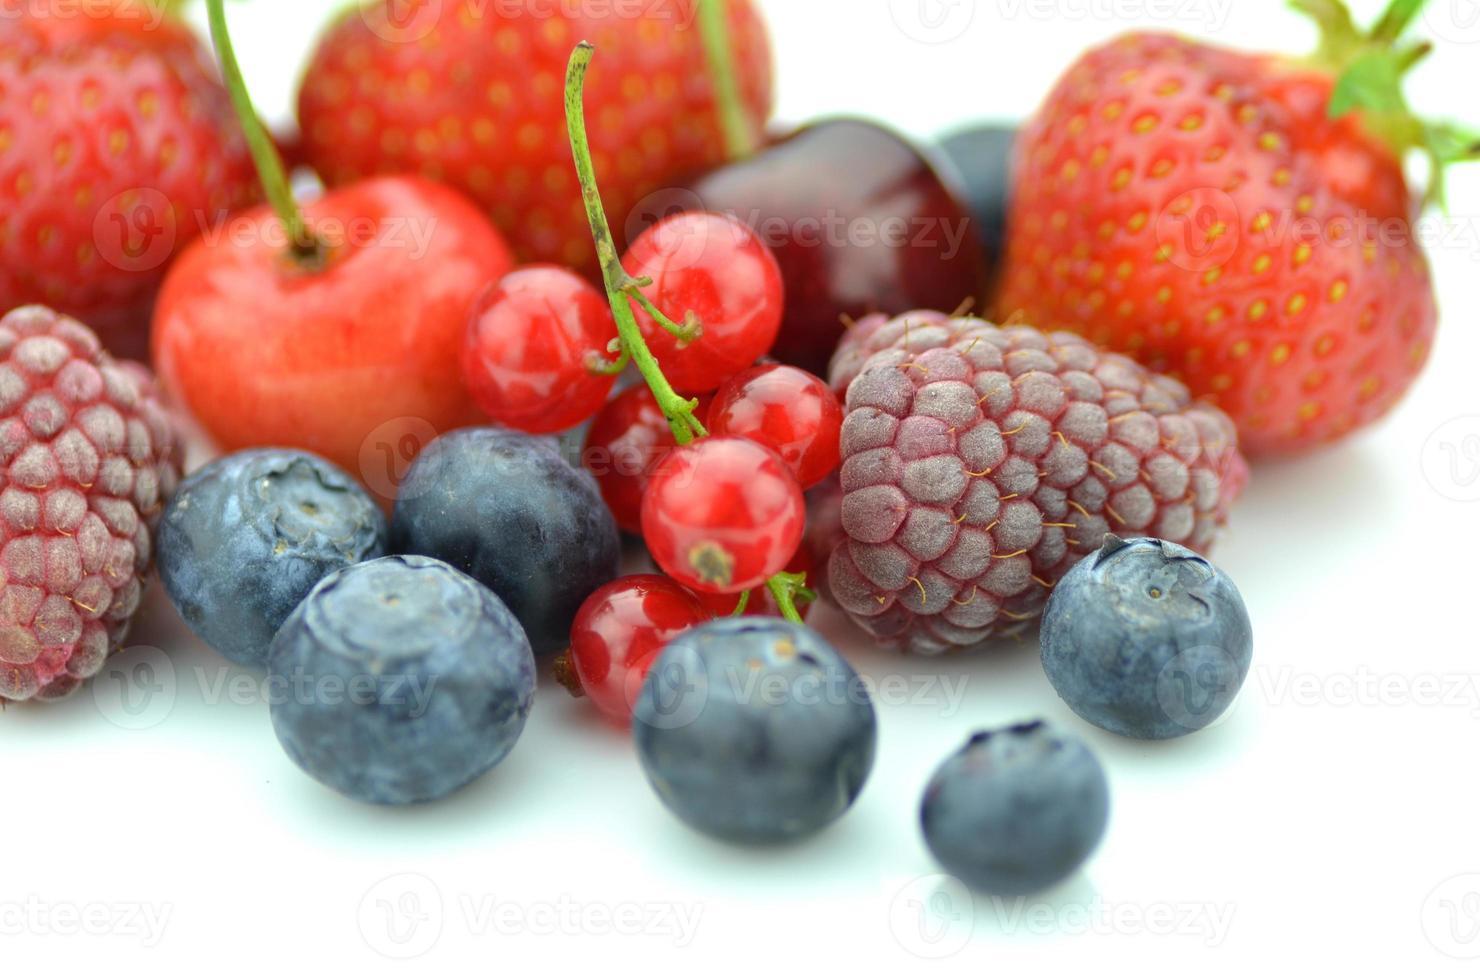 soft fruits strawberries raspberries cherries blueberries currants isolated on white photo